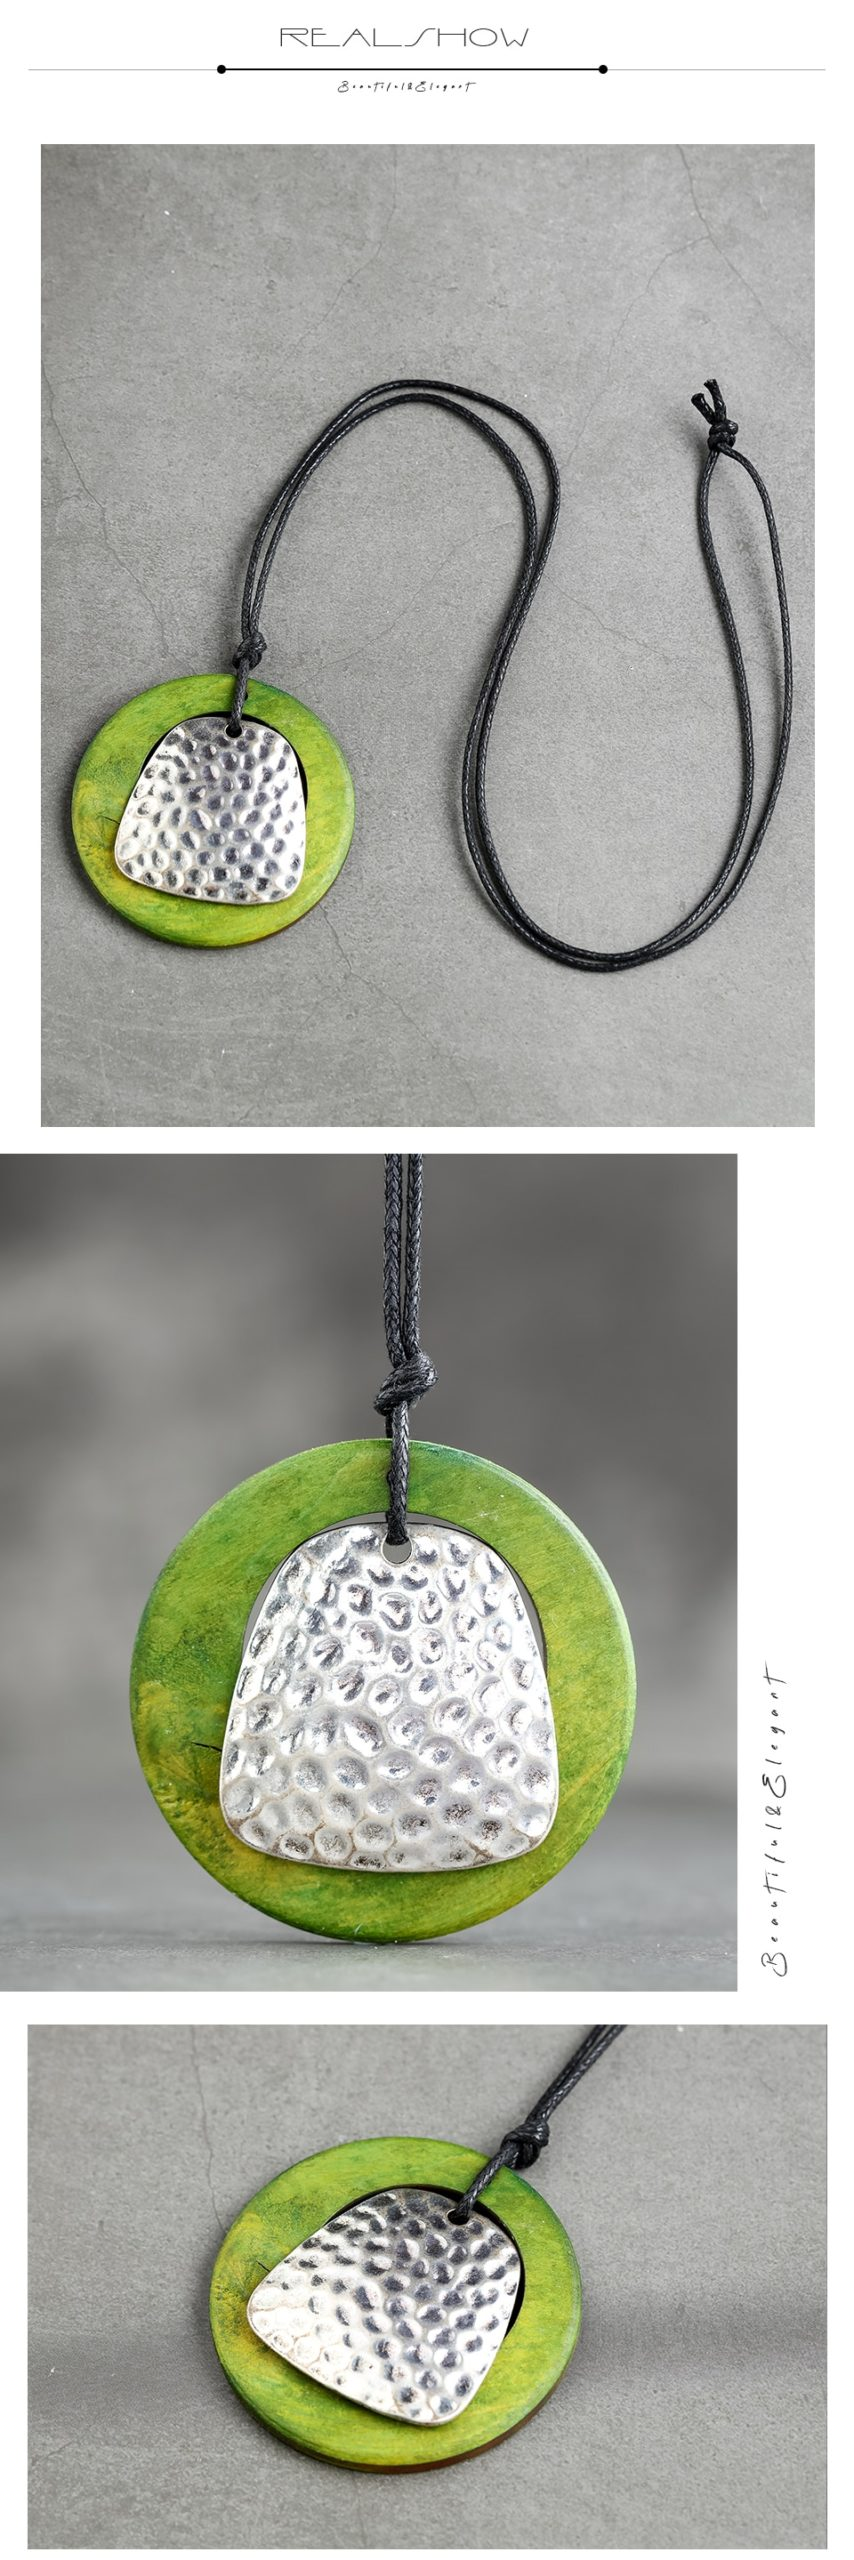 Green Wooden Long Necklace Women's Vintage Jewelry Handmade Accessories Zinc Alloy Necklaces&Pendants Suspension Jewellery 2020